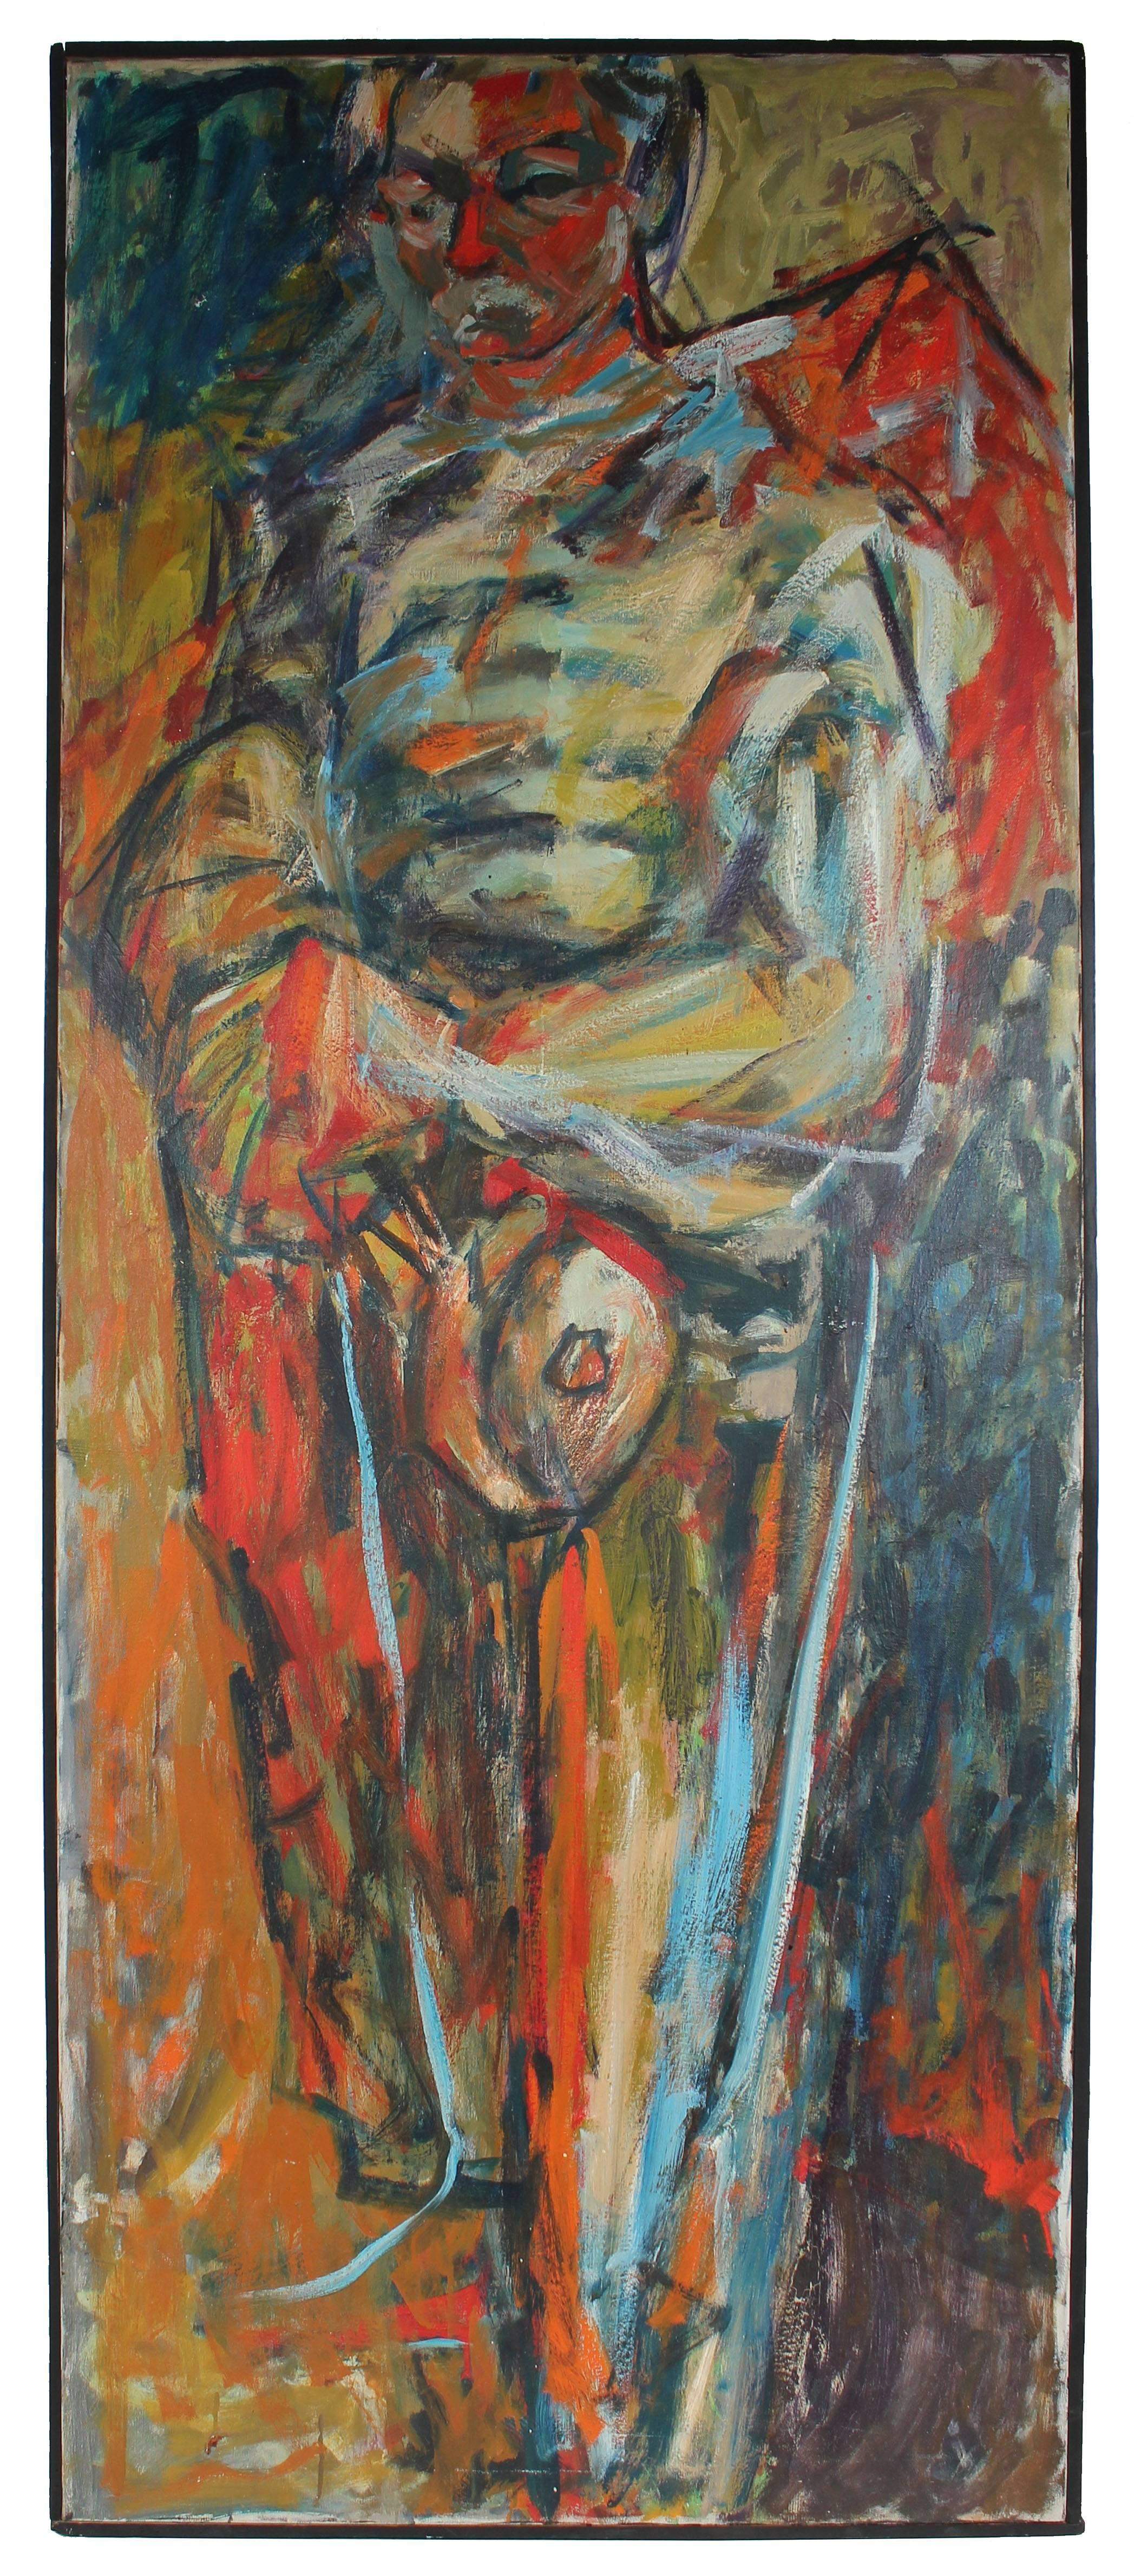 Portrait of Kenneth Washburn, Oil on Canvas, 1957